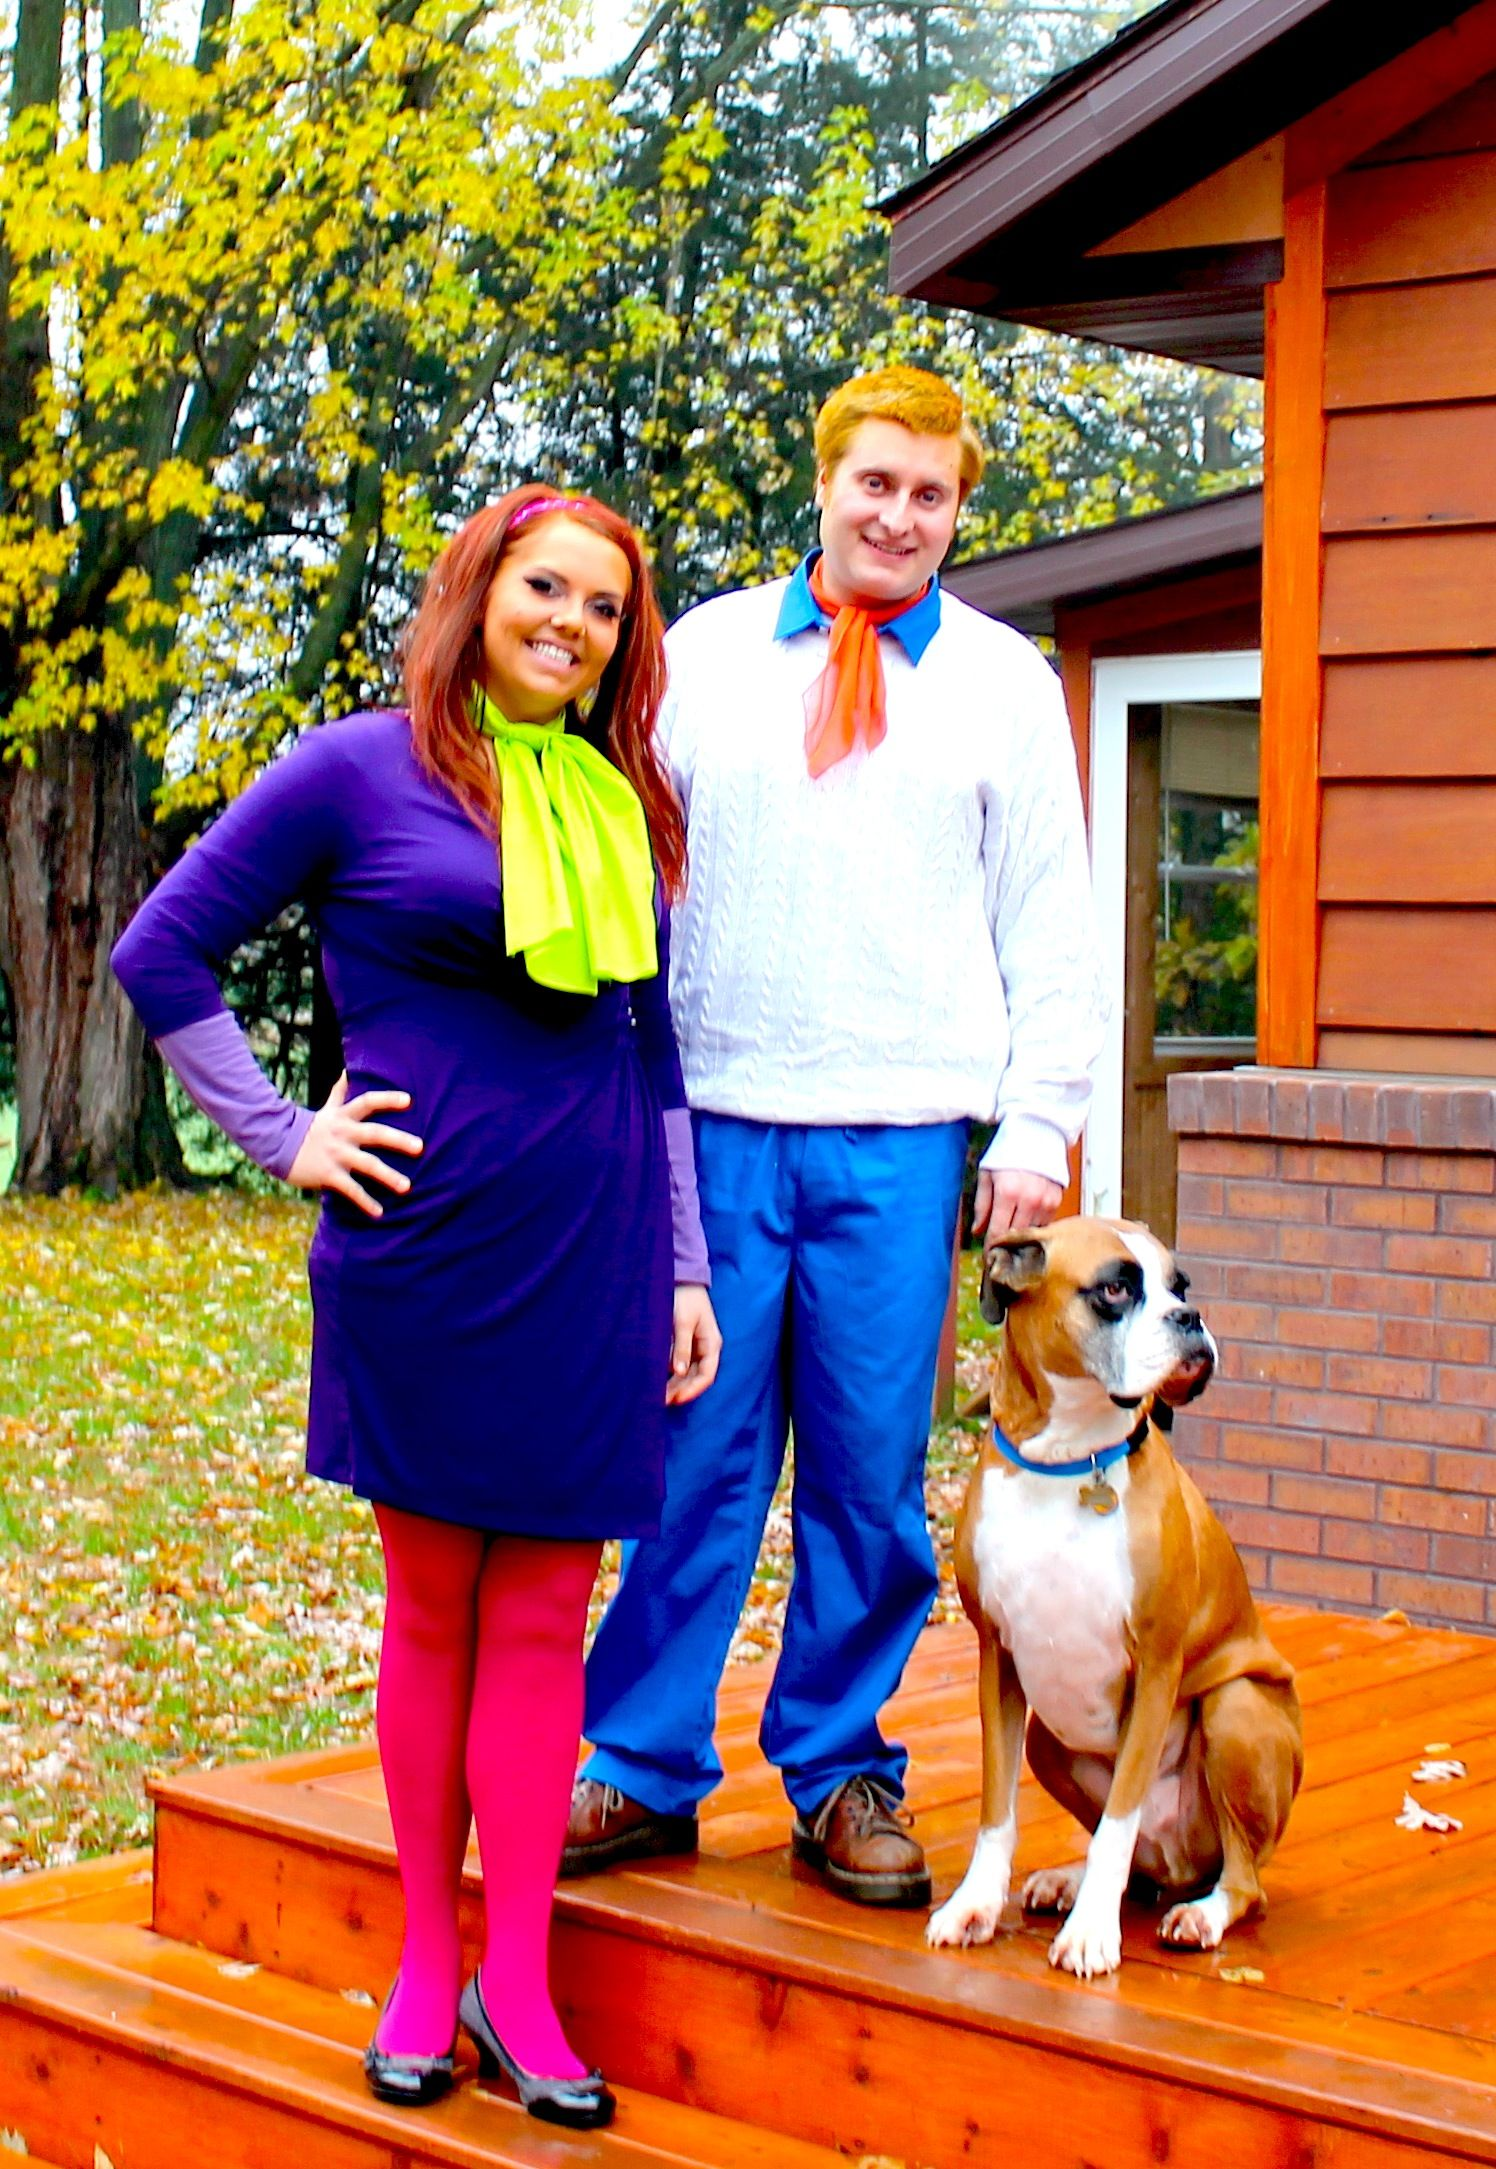 Diy Halloween Costume Fred Daphne Scooby Scooby Doo Halloween